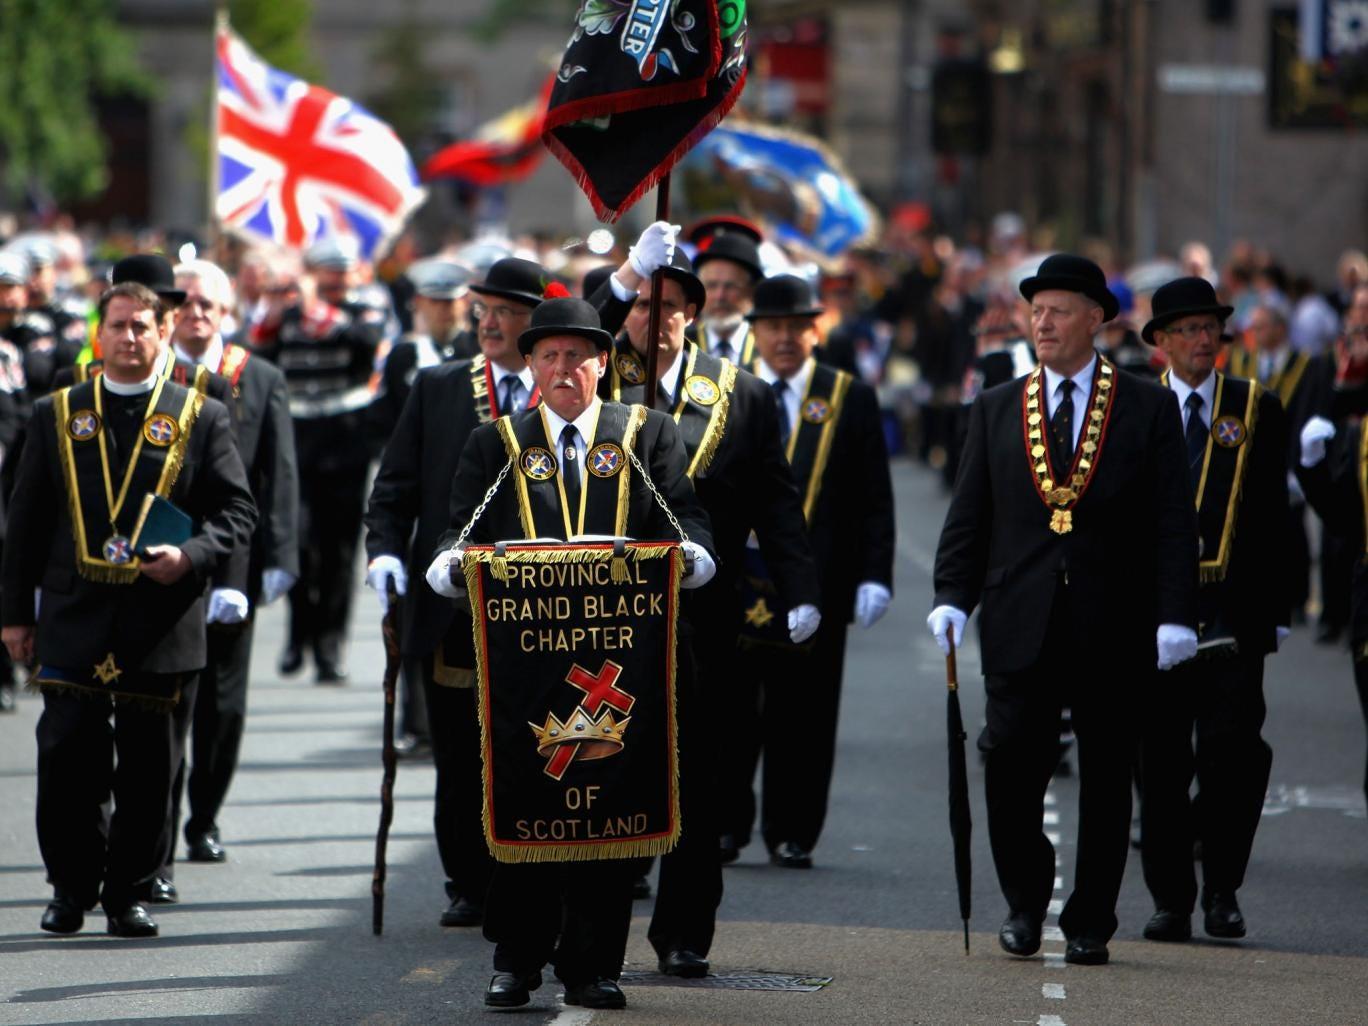 Grand Black Chapter of Scotland's Orange Order hopes 15,000 members will march in Edinburgh